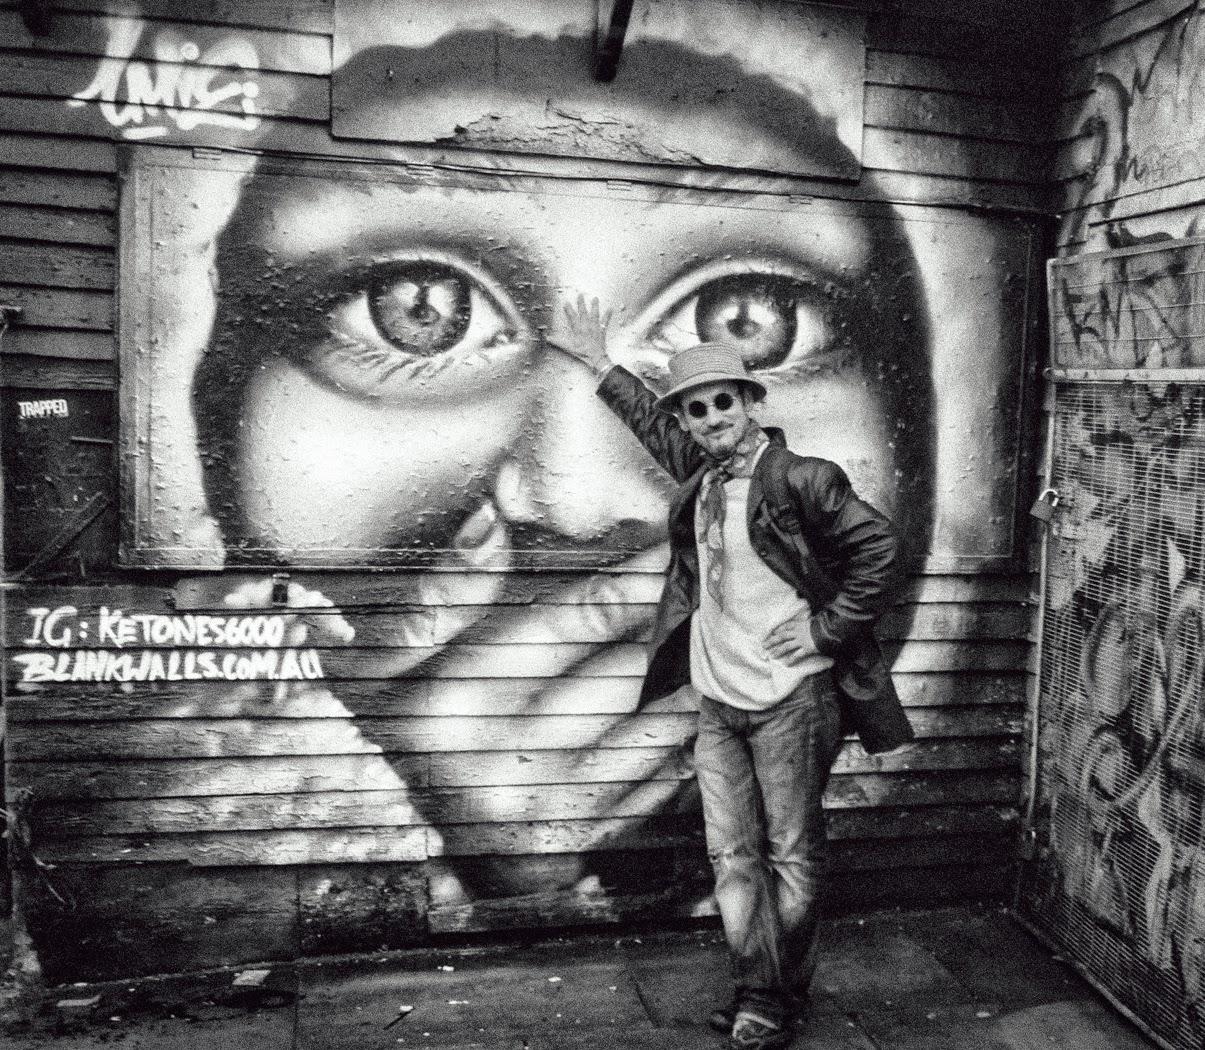 Graffite+painter+no+1.jpg